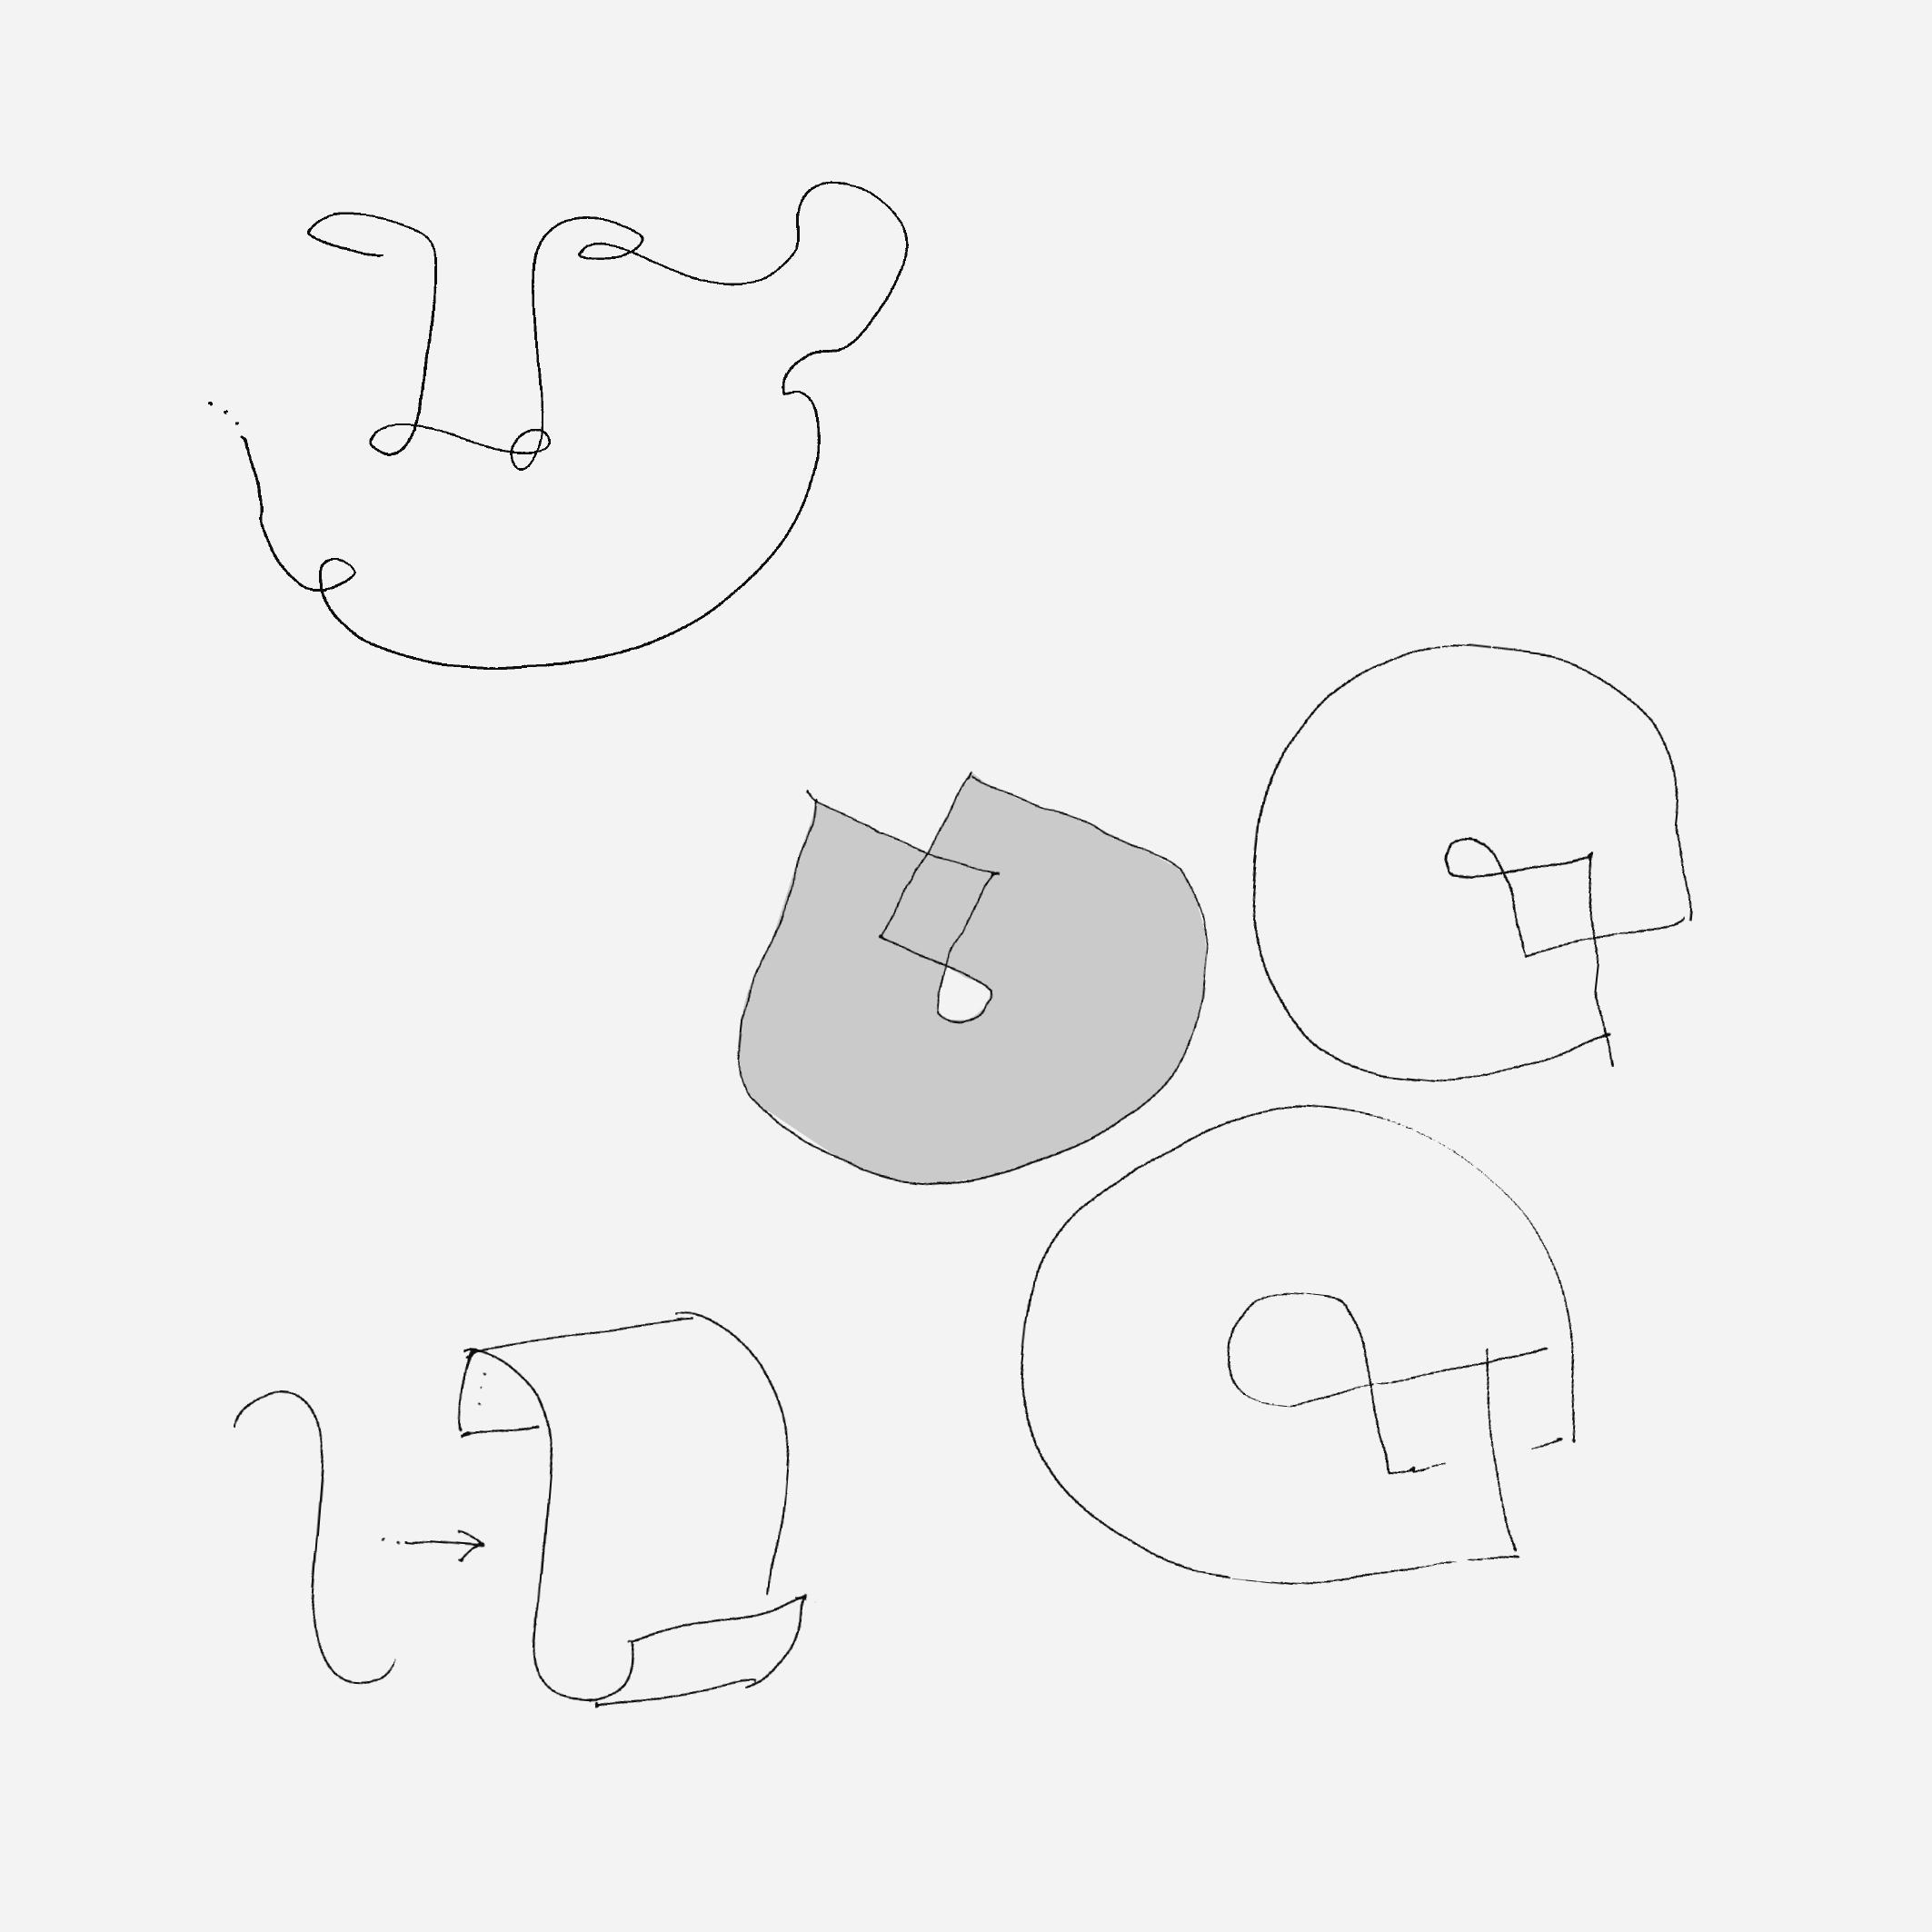 sketch_2126x2126